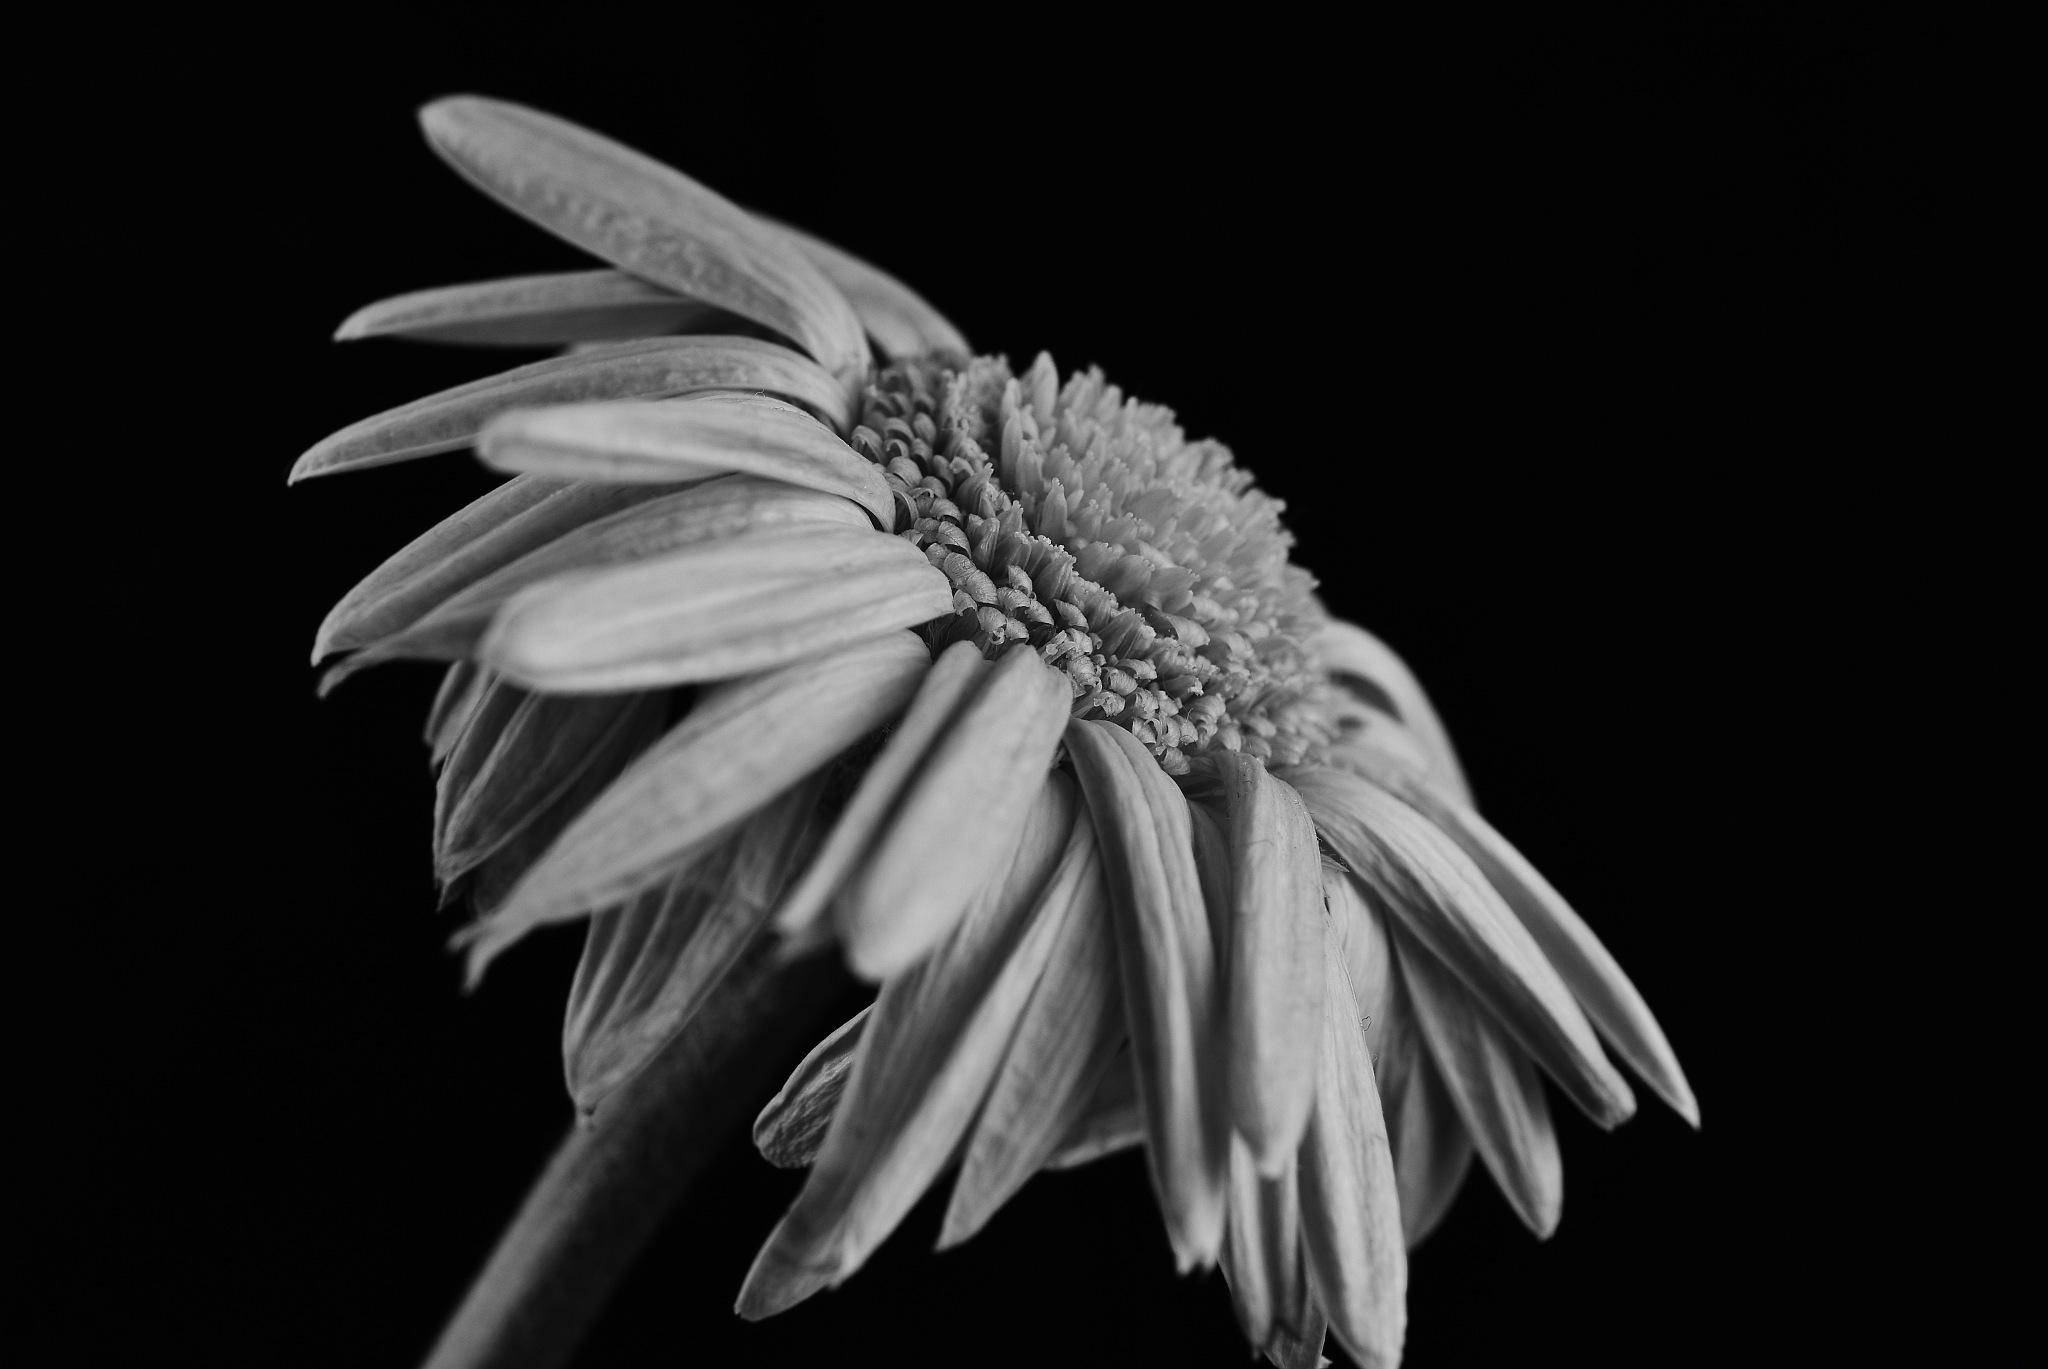 Germini flower B&W by Theresia Buskas